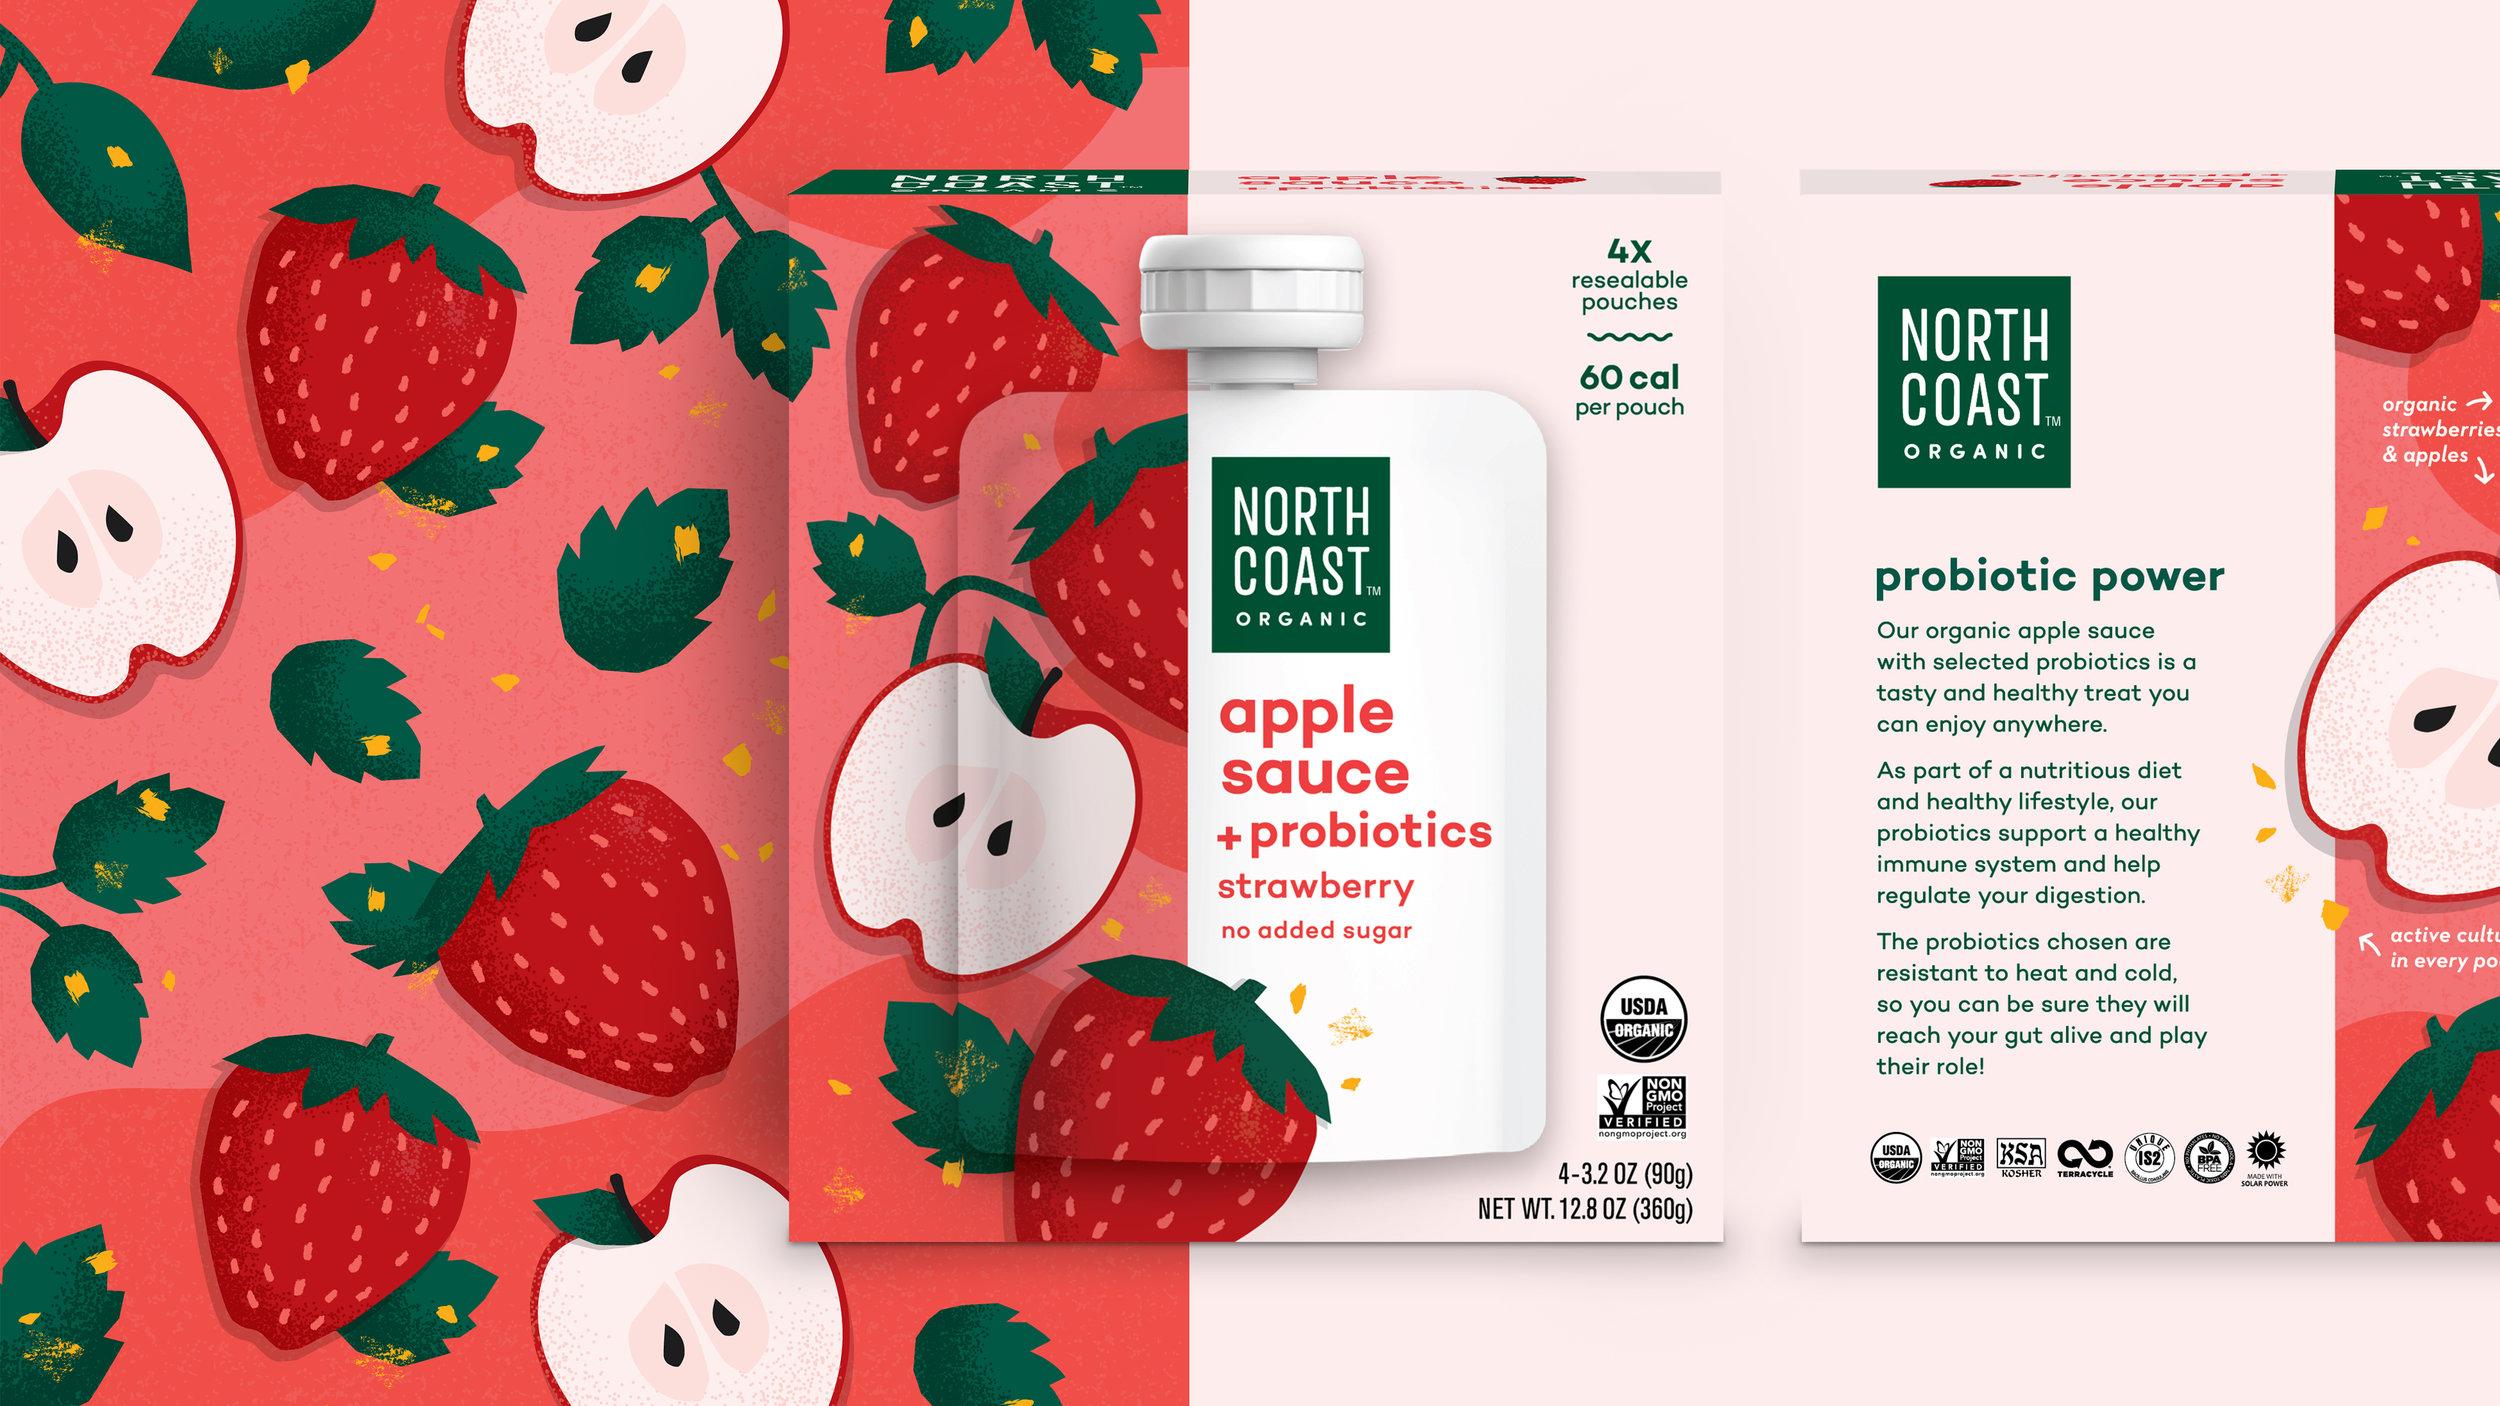 NorthCoast_Web_Box_AppleStrawberry_v1.jpg